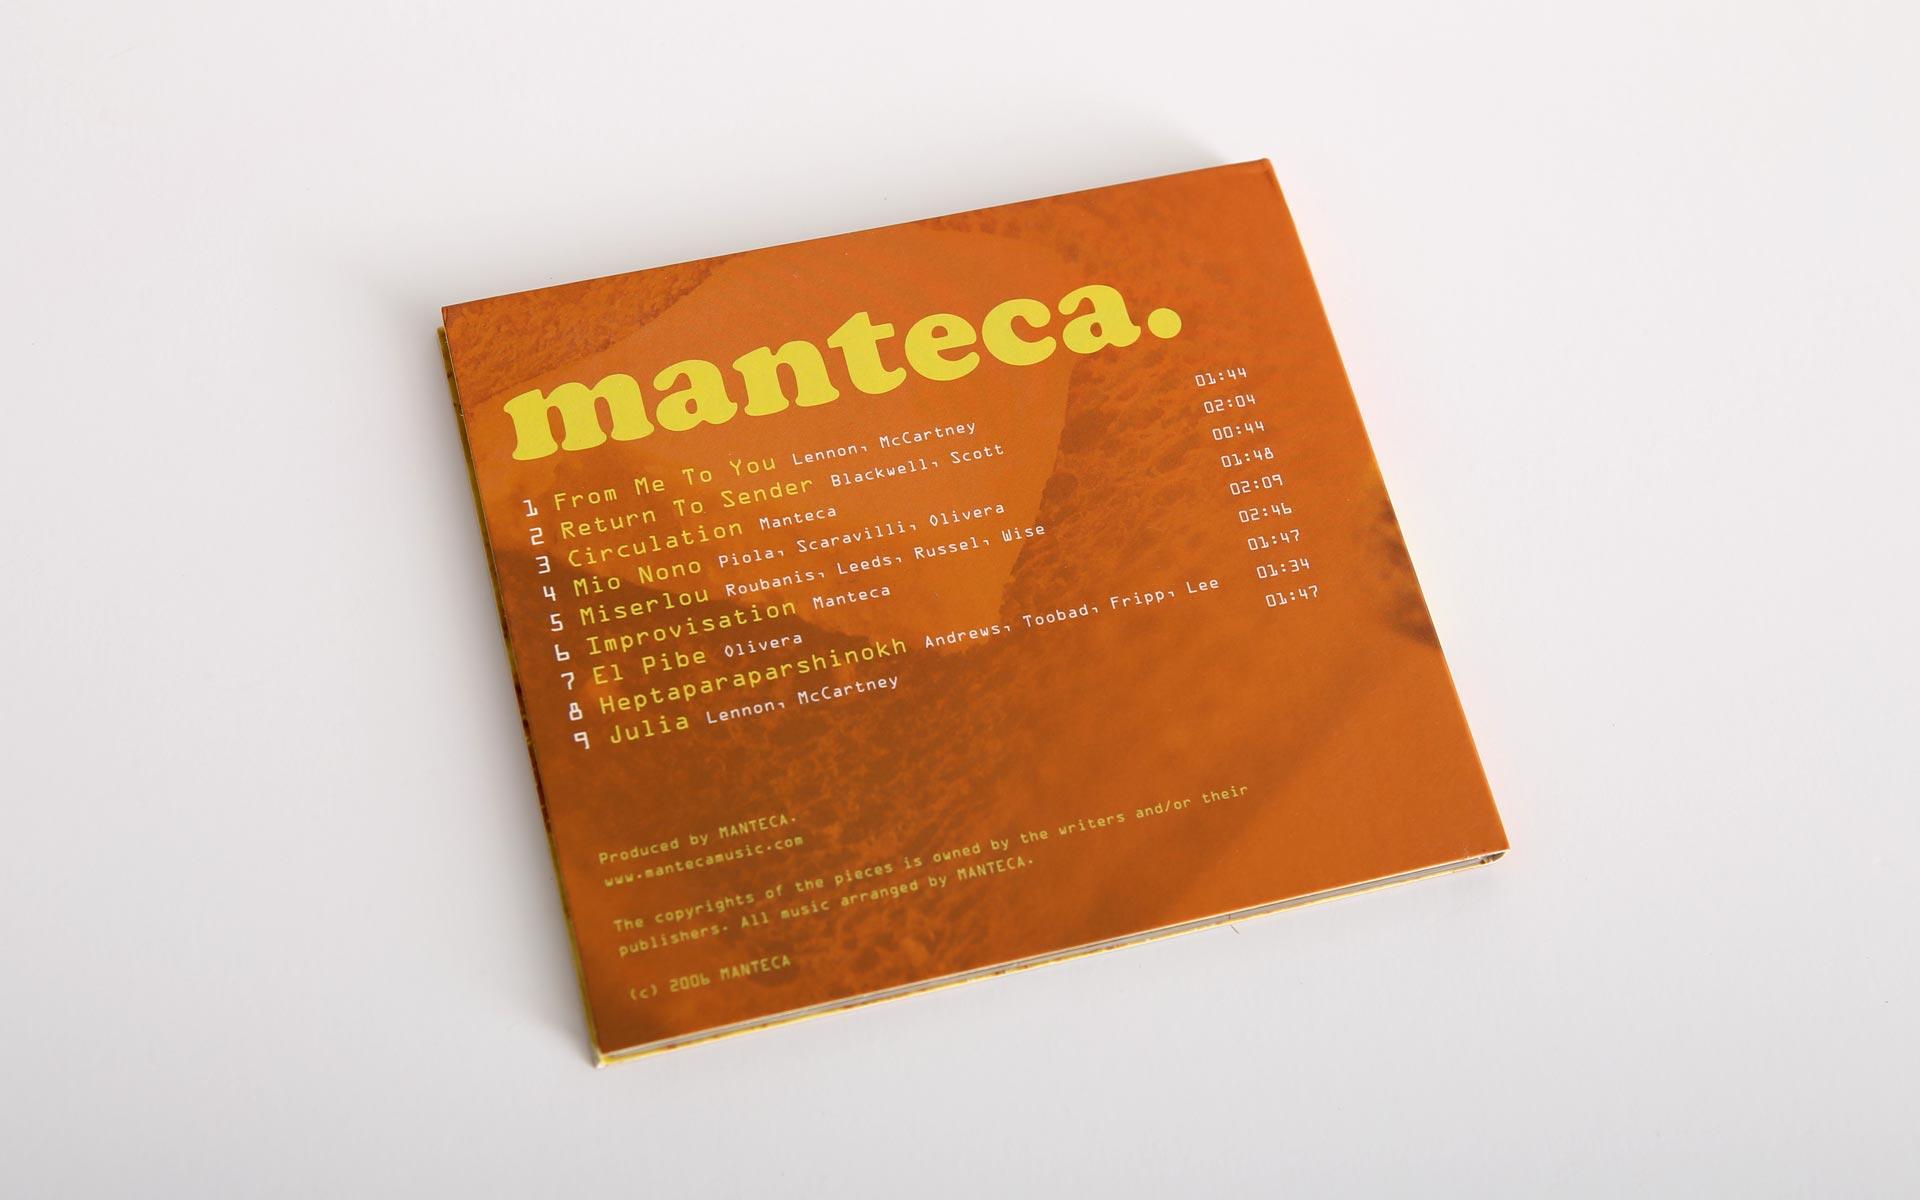 guitar-circle-cd-graphic-design-3